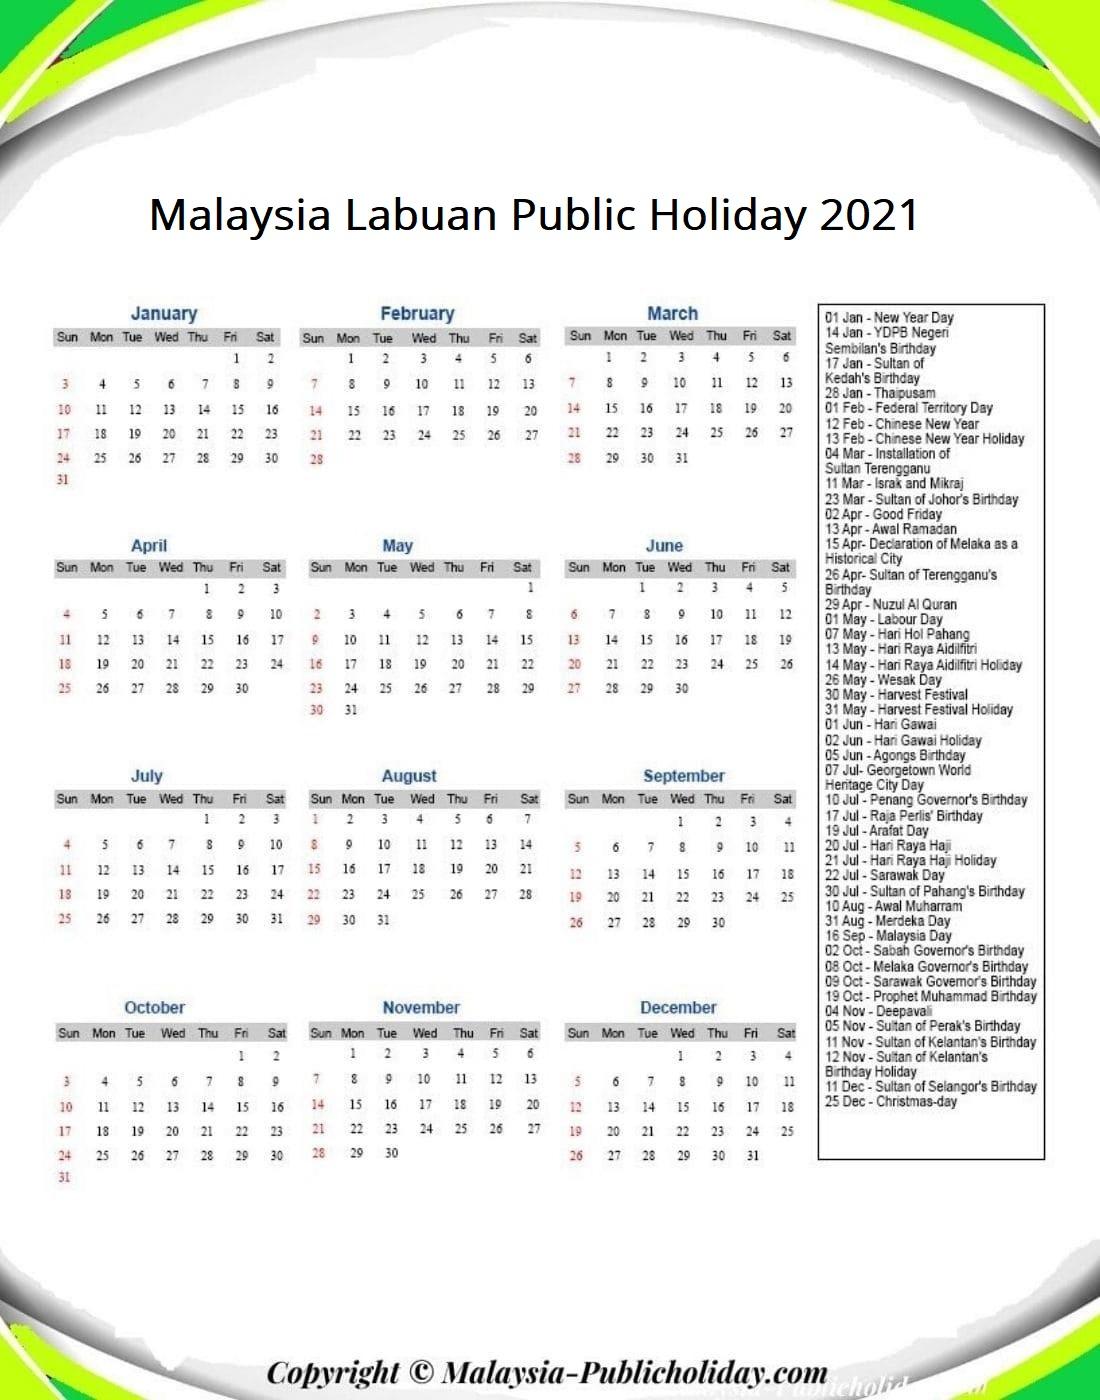 Labuan Calendars with Holidays 2021